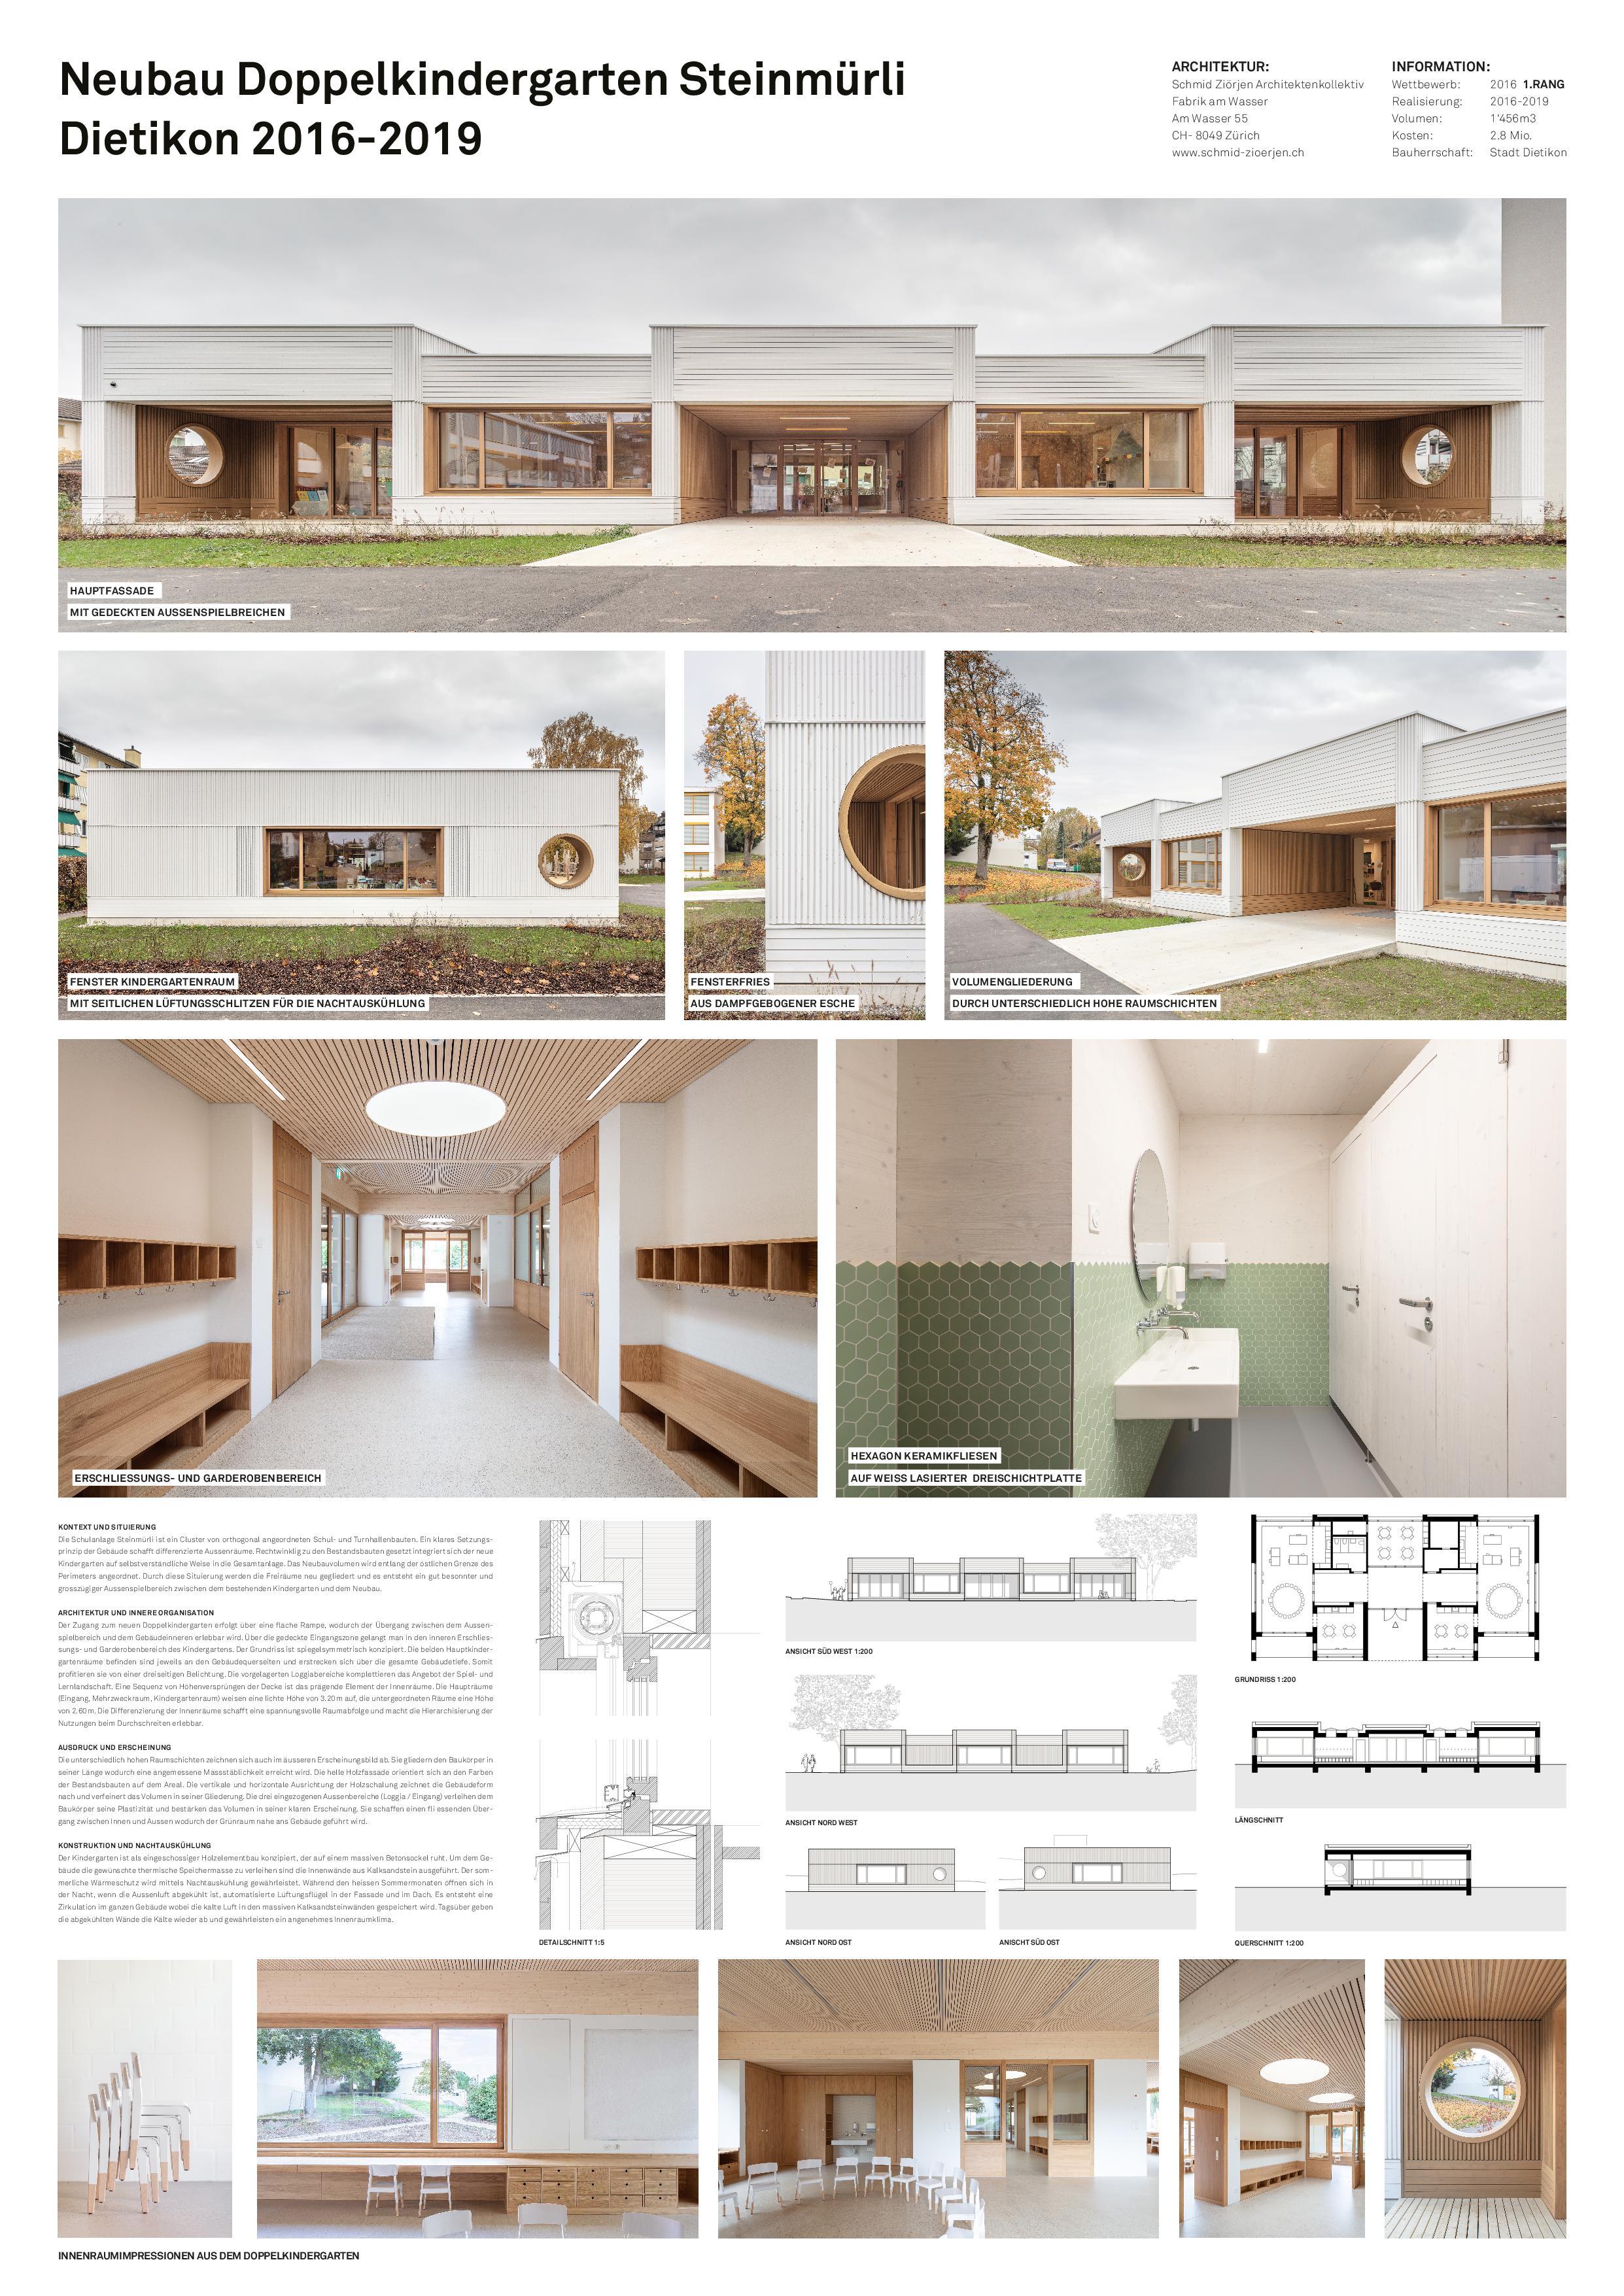 A0 Plakat Neubau Doppelkindergarten Steinmürli Dietikon von Schmid Ziörjen Architektenkollektiv